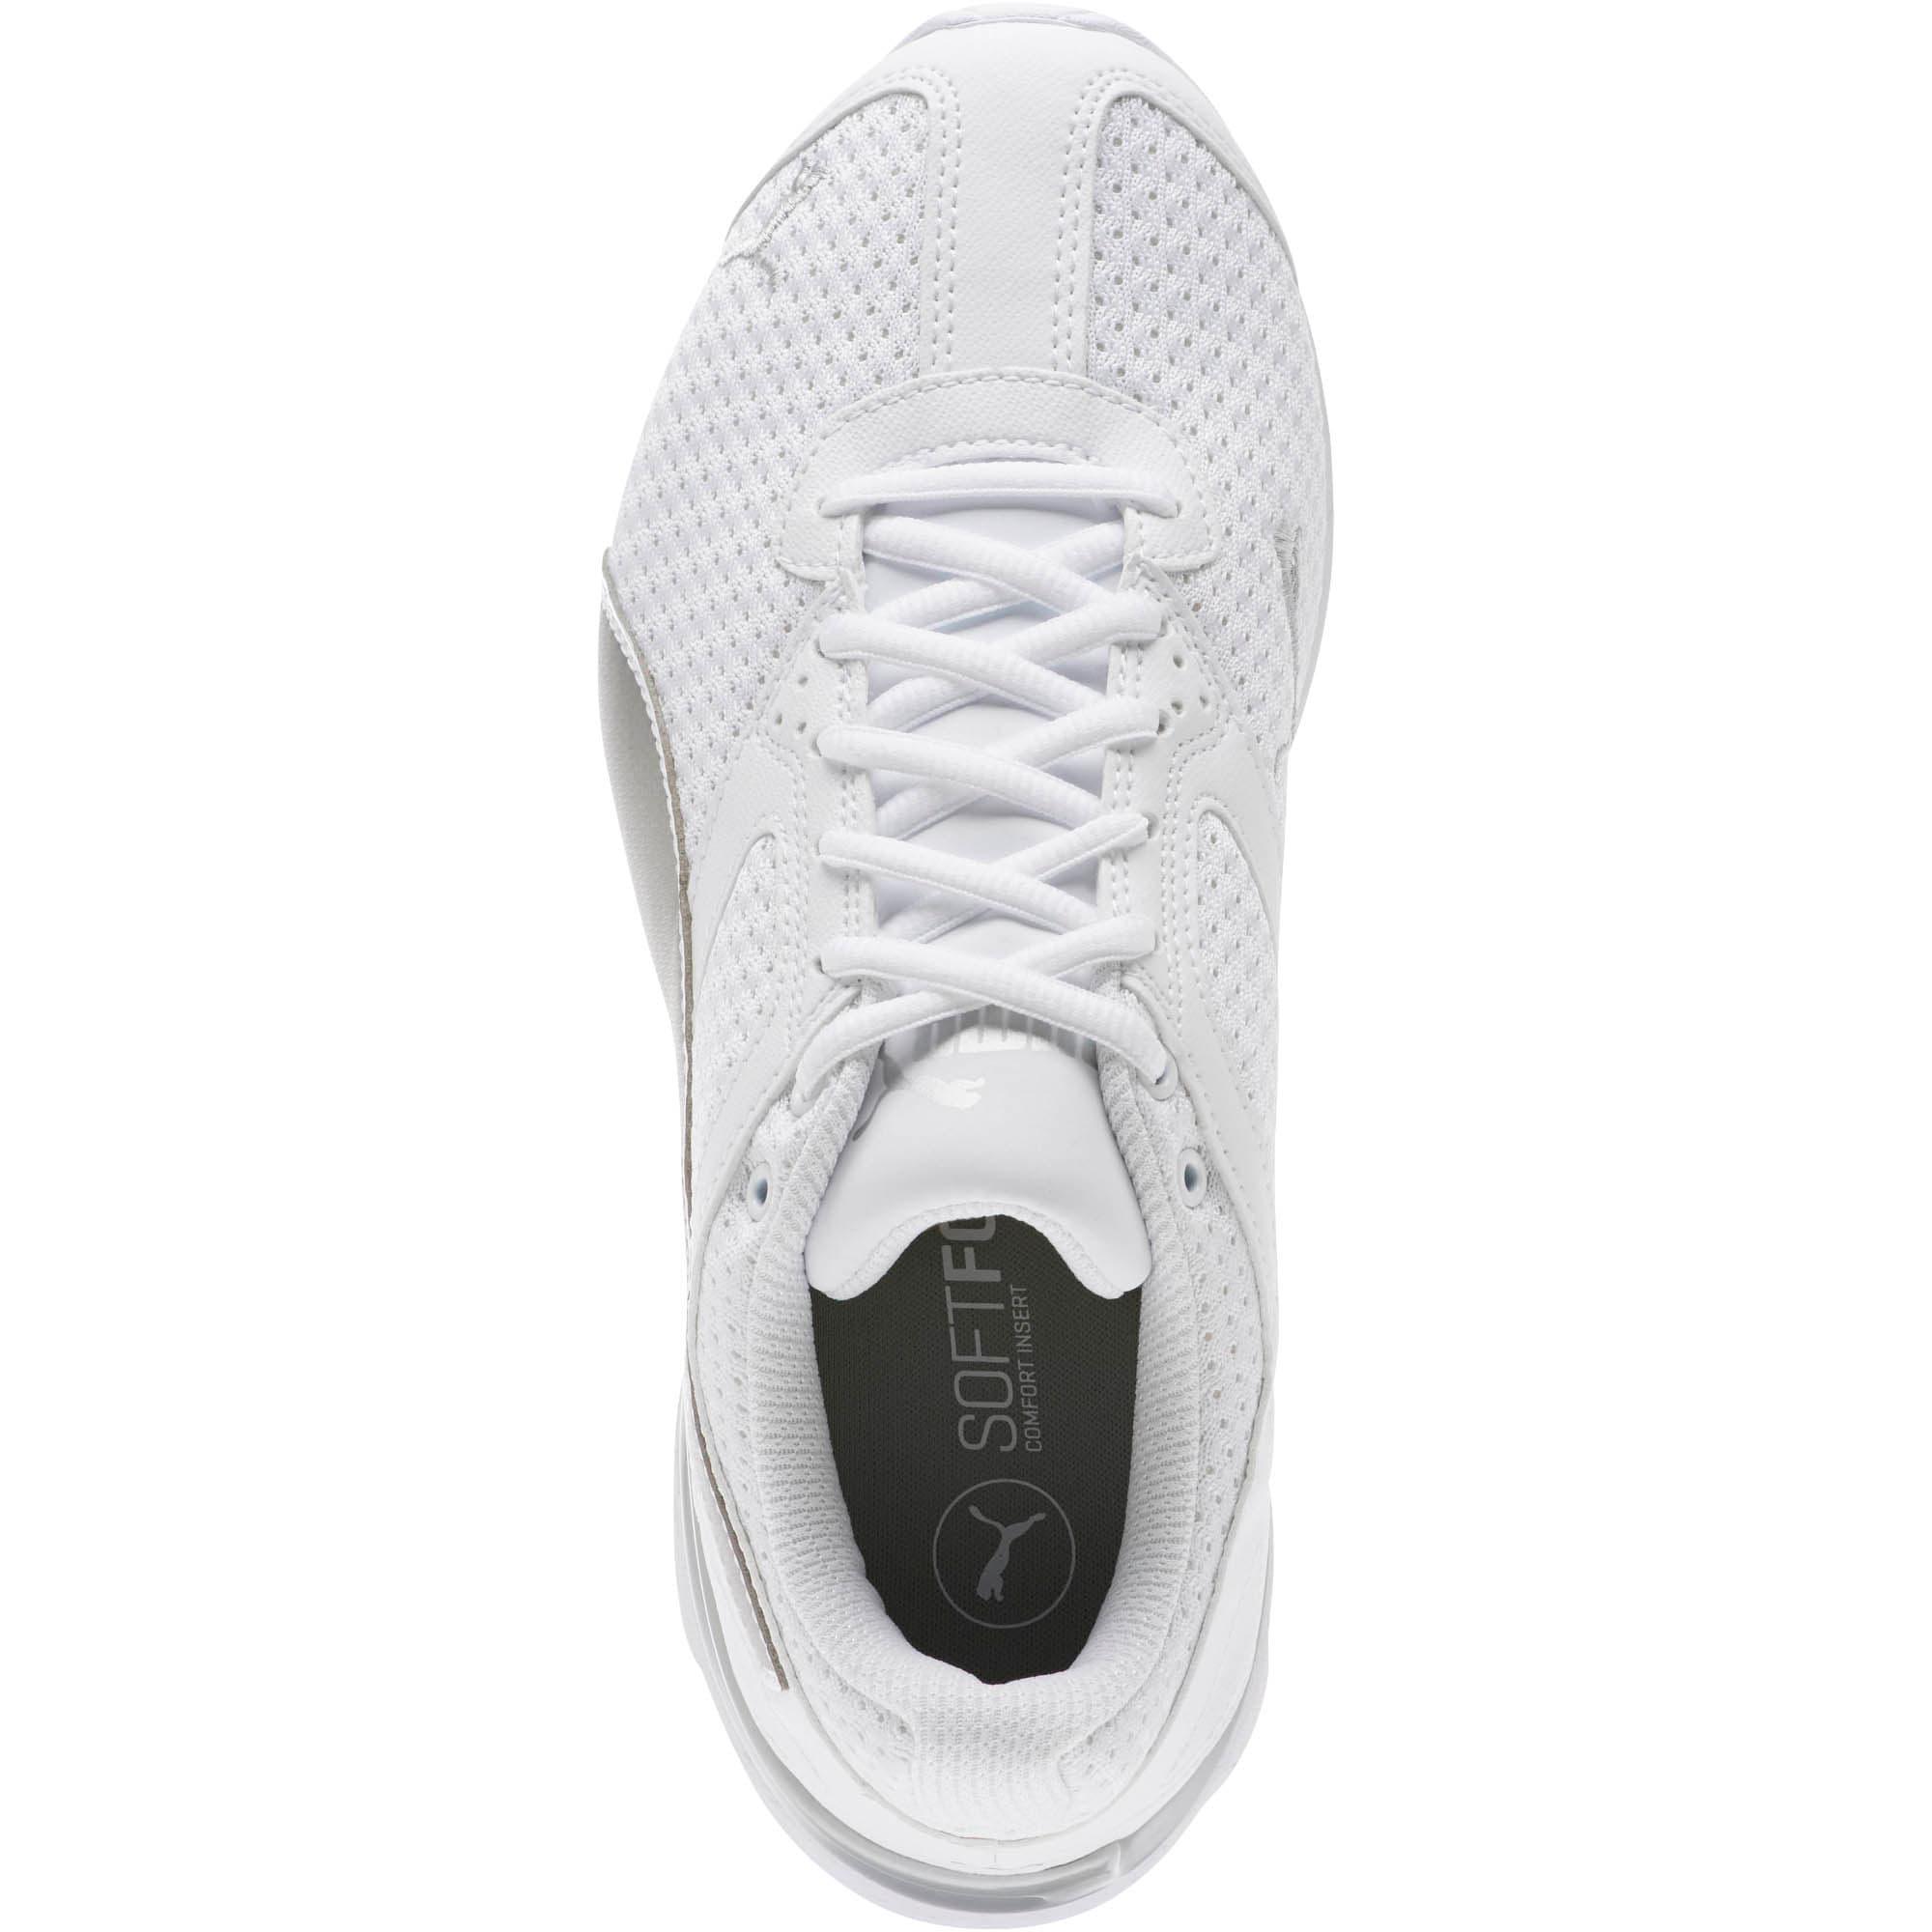 Thumbnail 5 of Tazon 6 Knit Women's Sneakers, Puma White-Puma Silver, medium